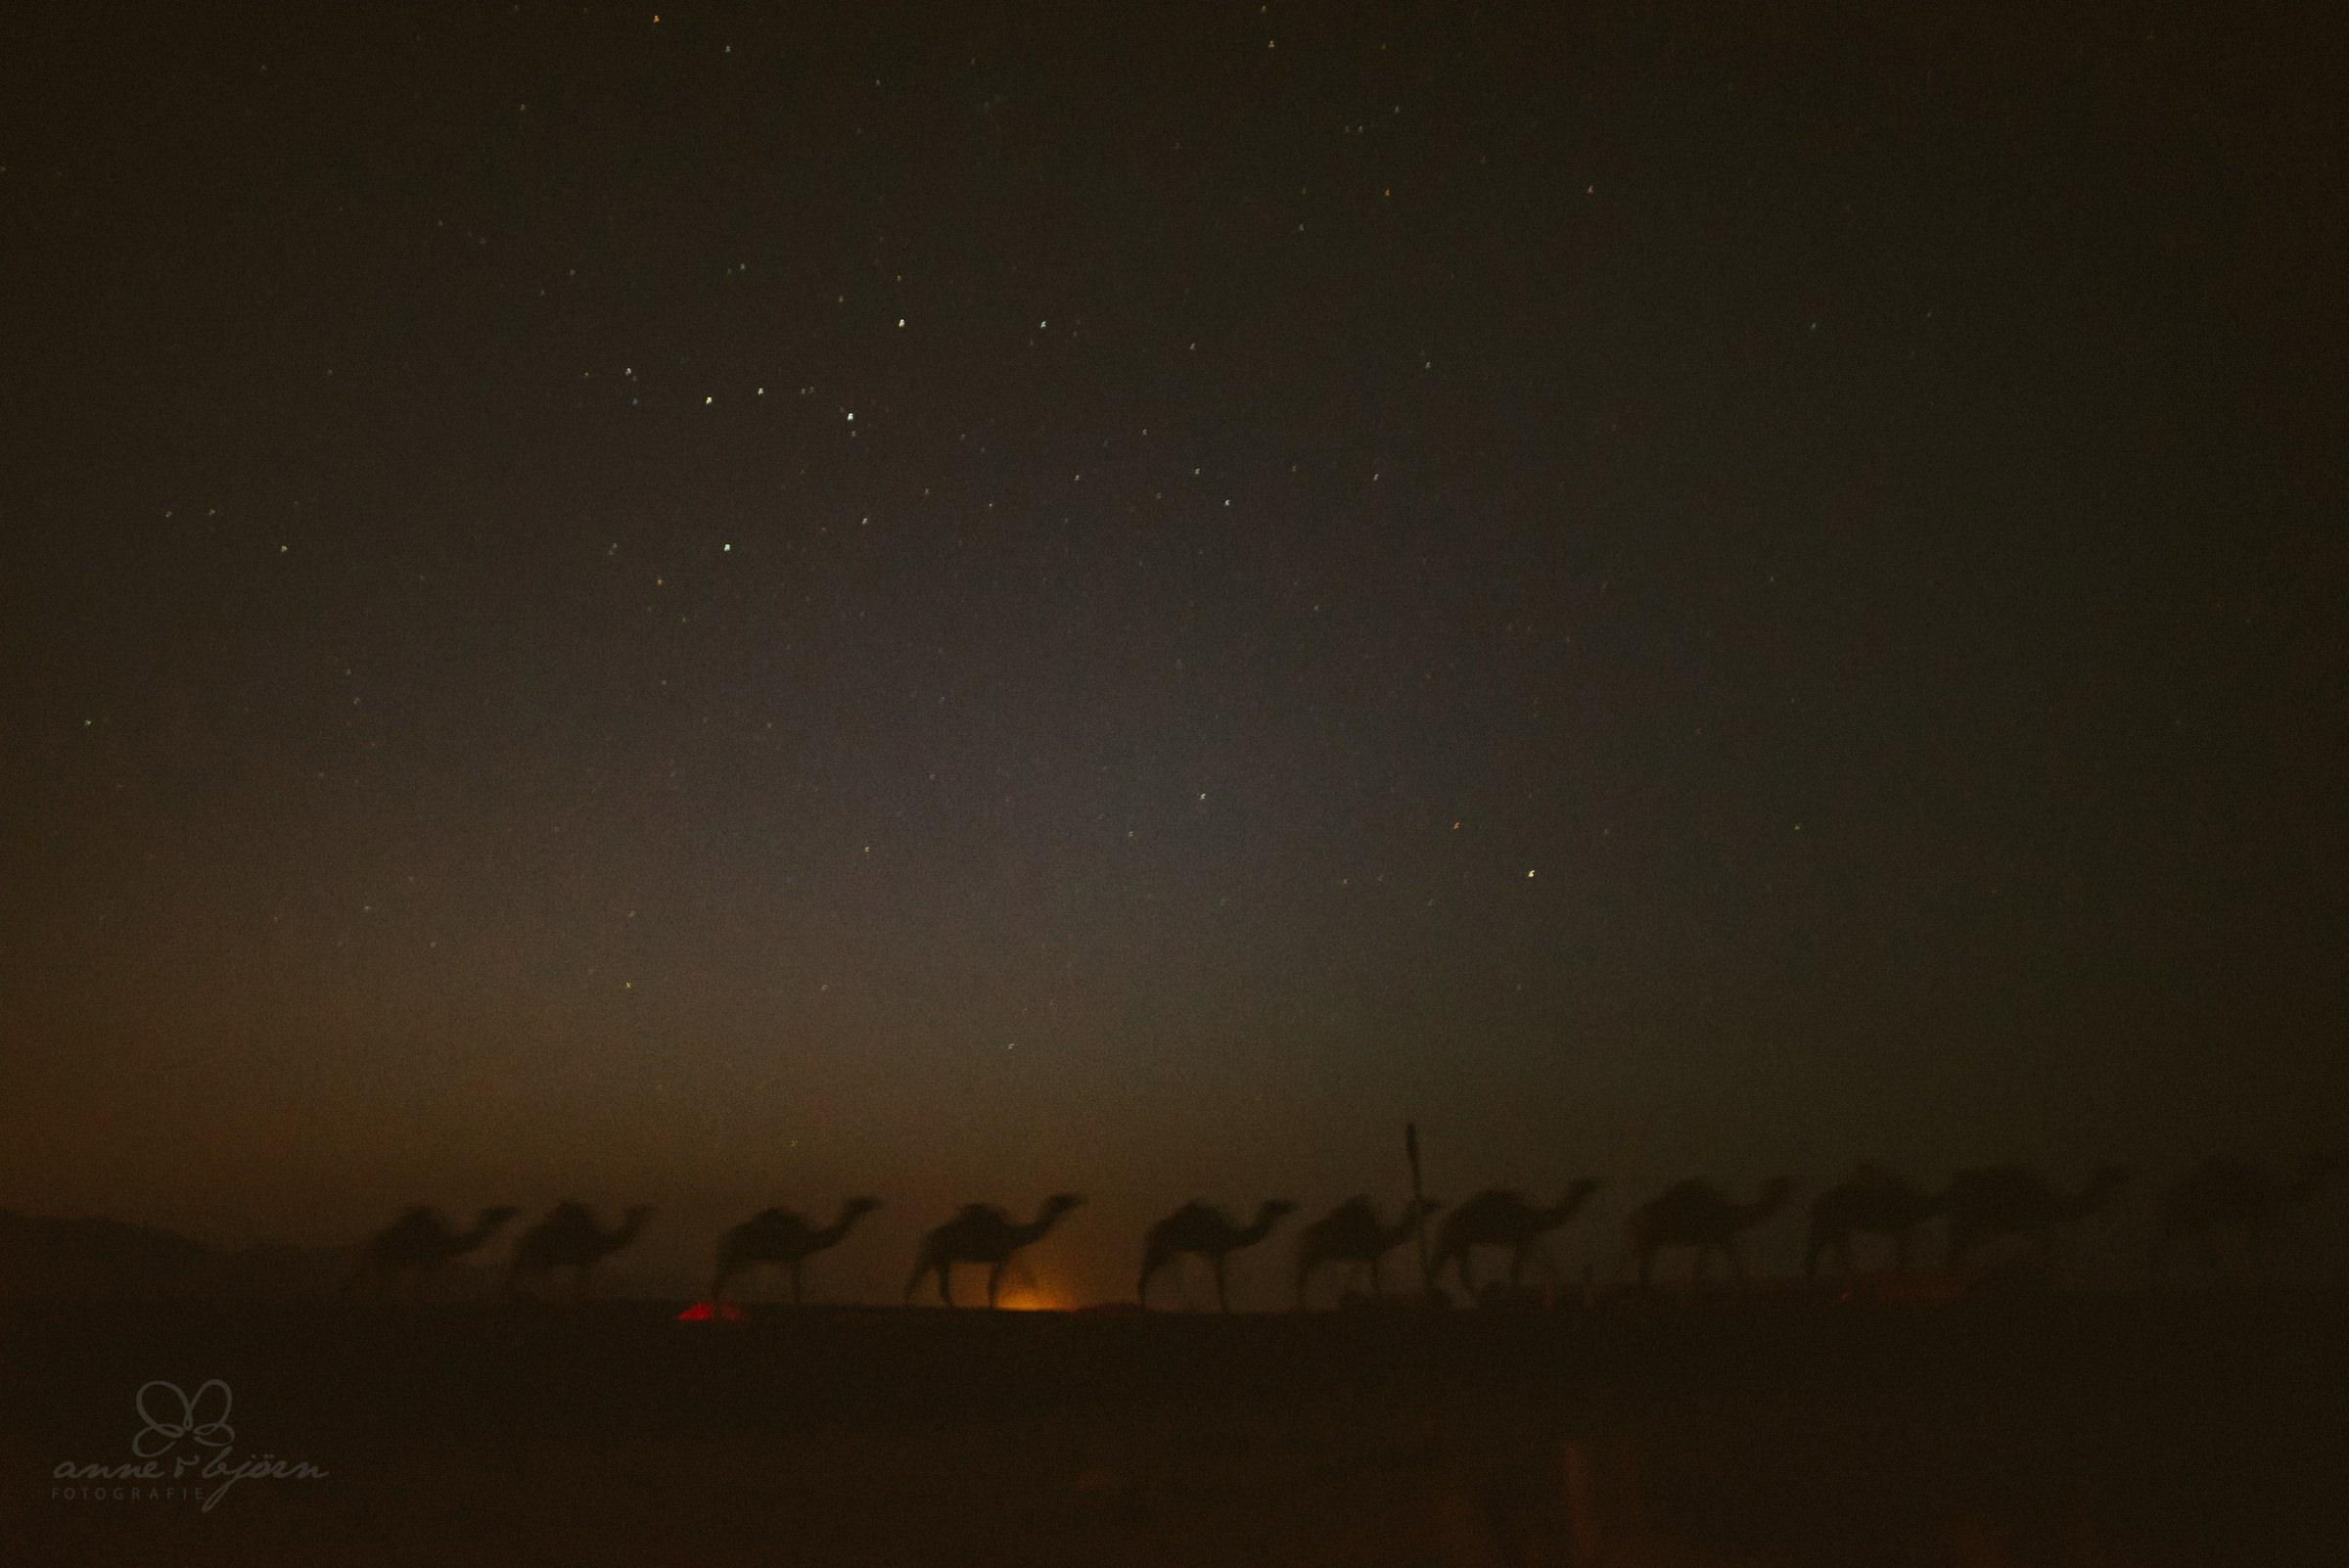 Kamele, Sonnenuntergang, Wüste, Sternenhimmel, Langzeitbelichtung